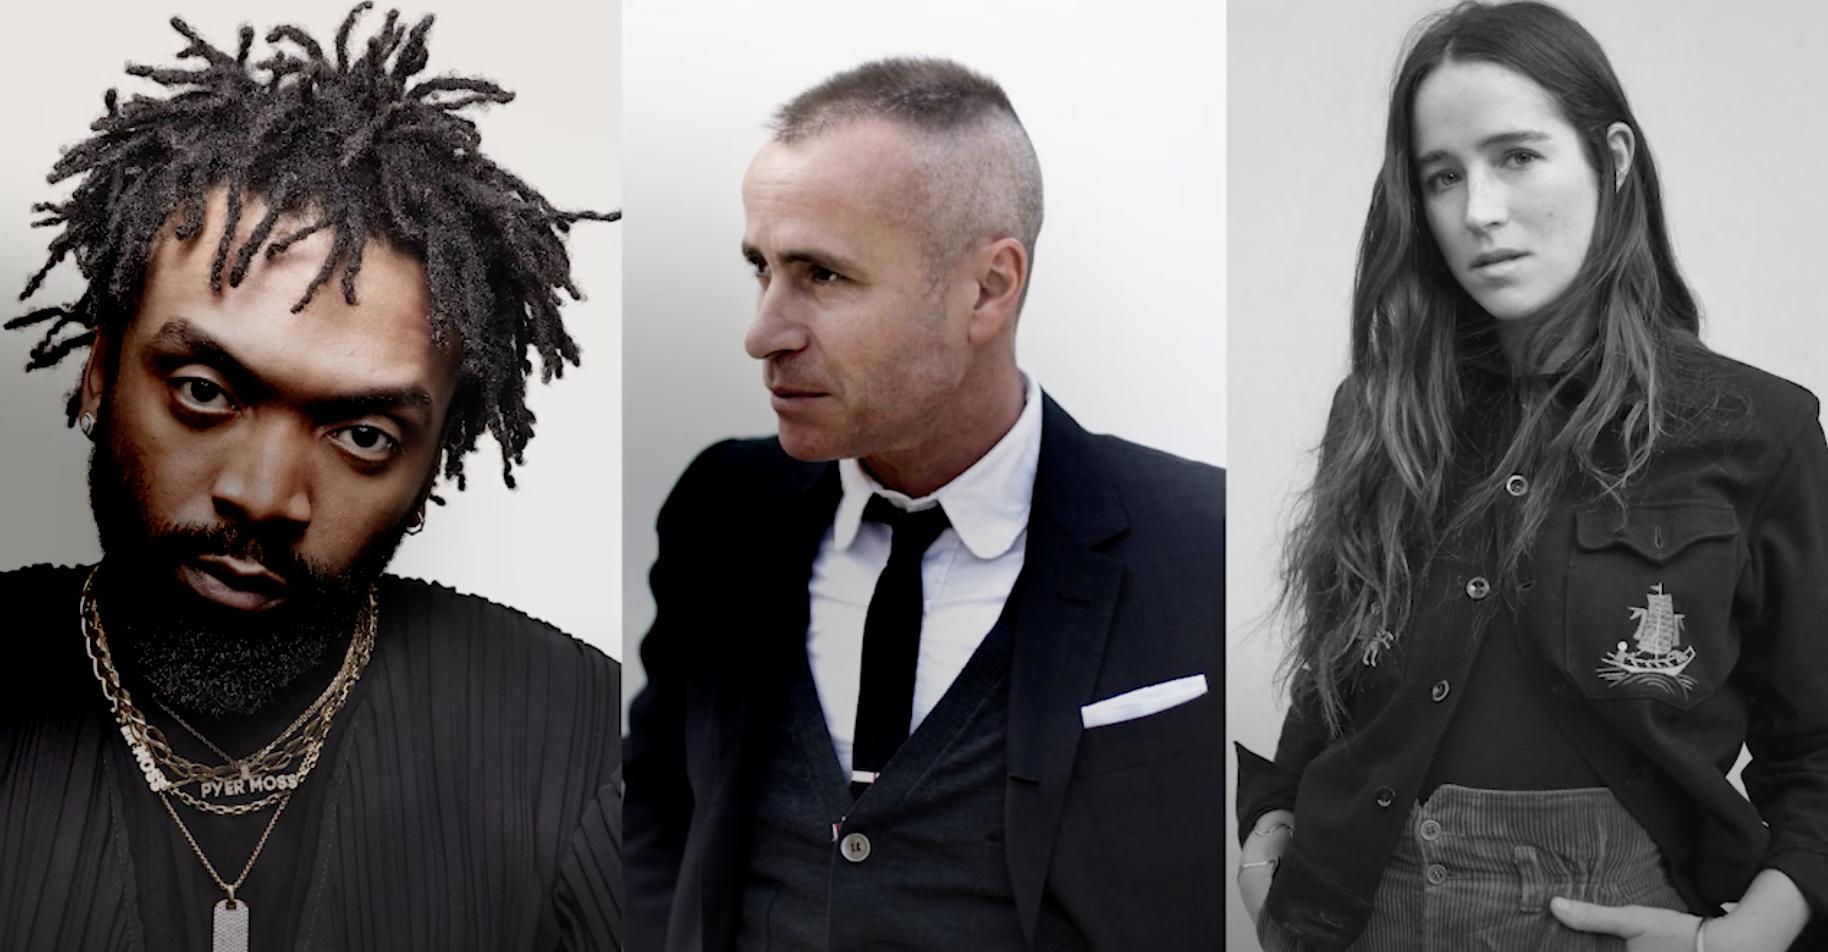 CFDA 2020 Fashion Award Winners Announced